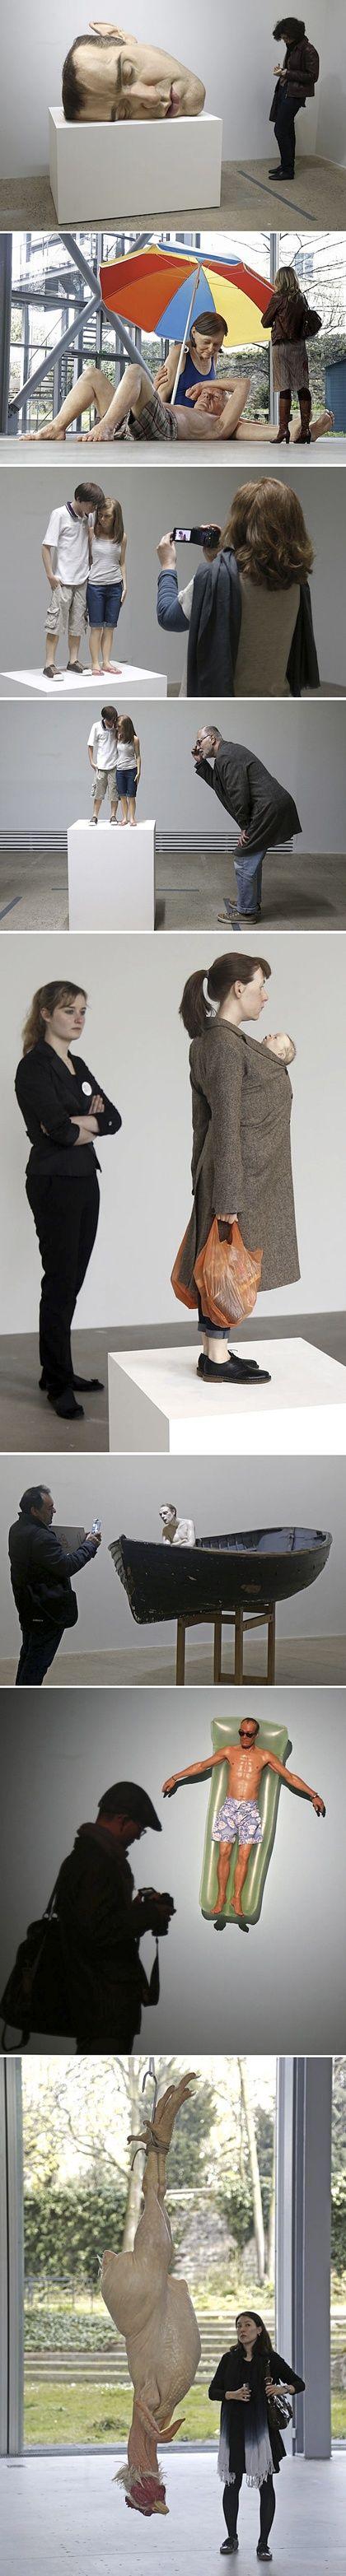 ron mueck sculptures   Ron Mueck : Hyper-Realistic Sculptures   Art